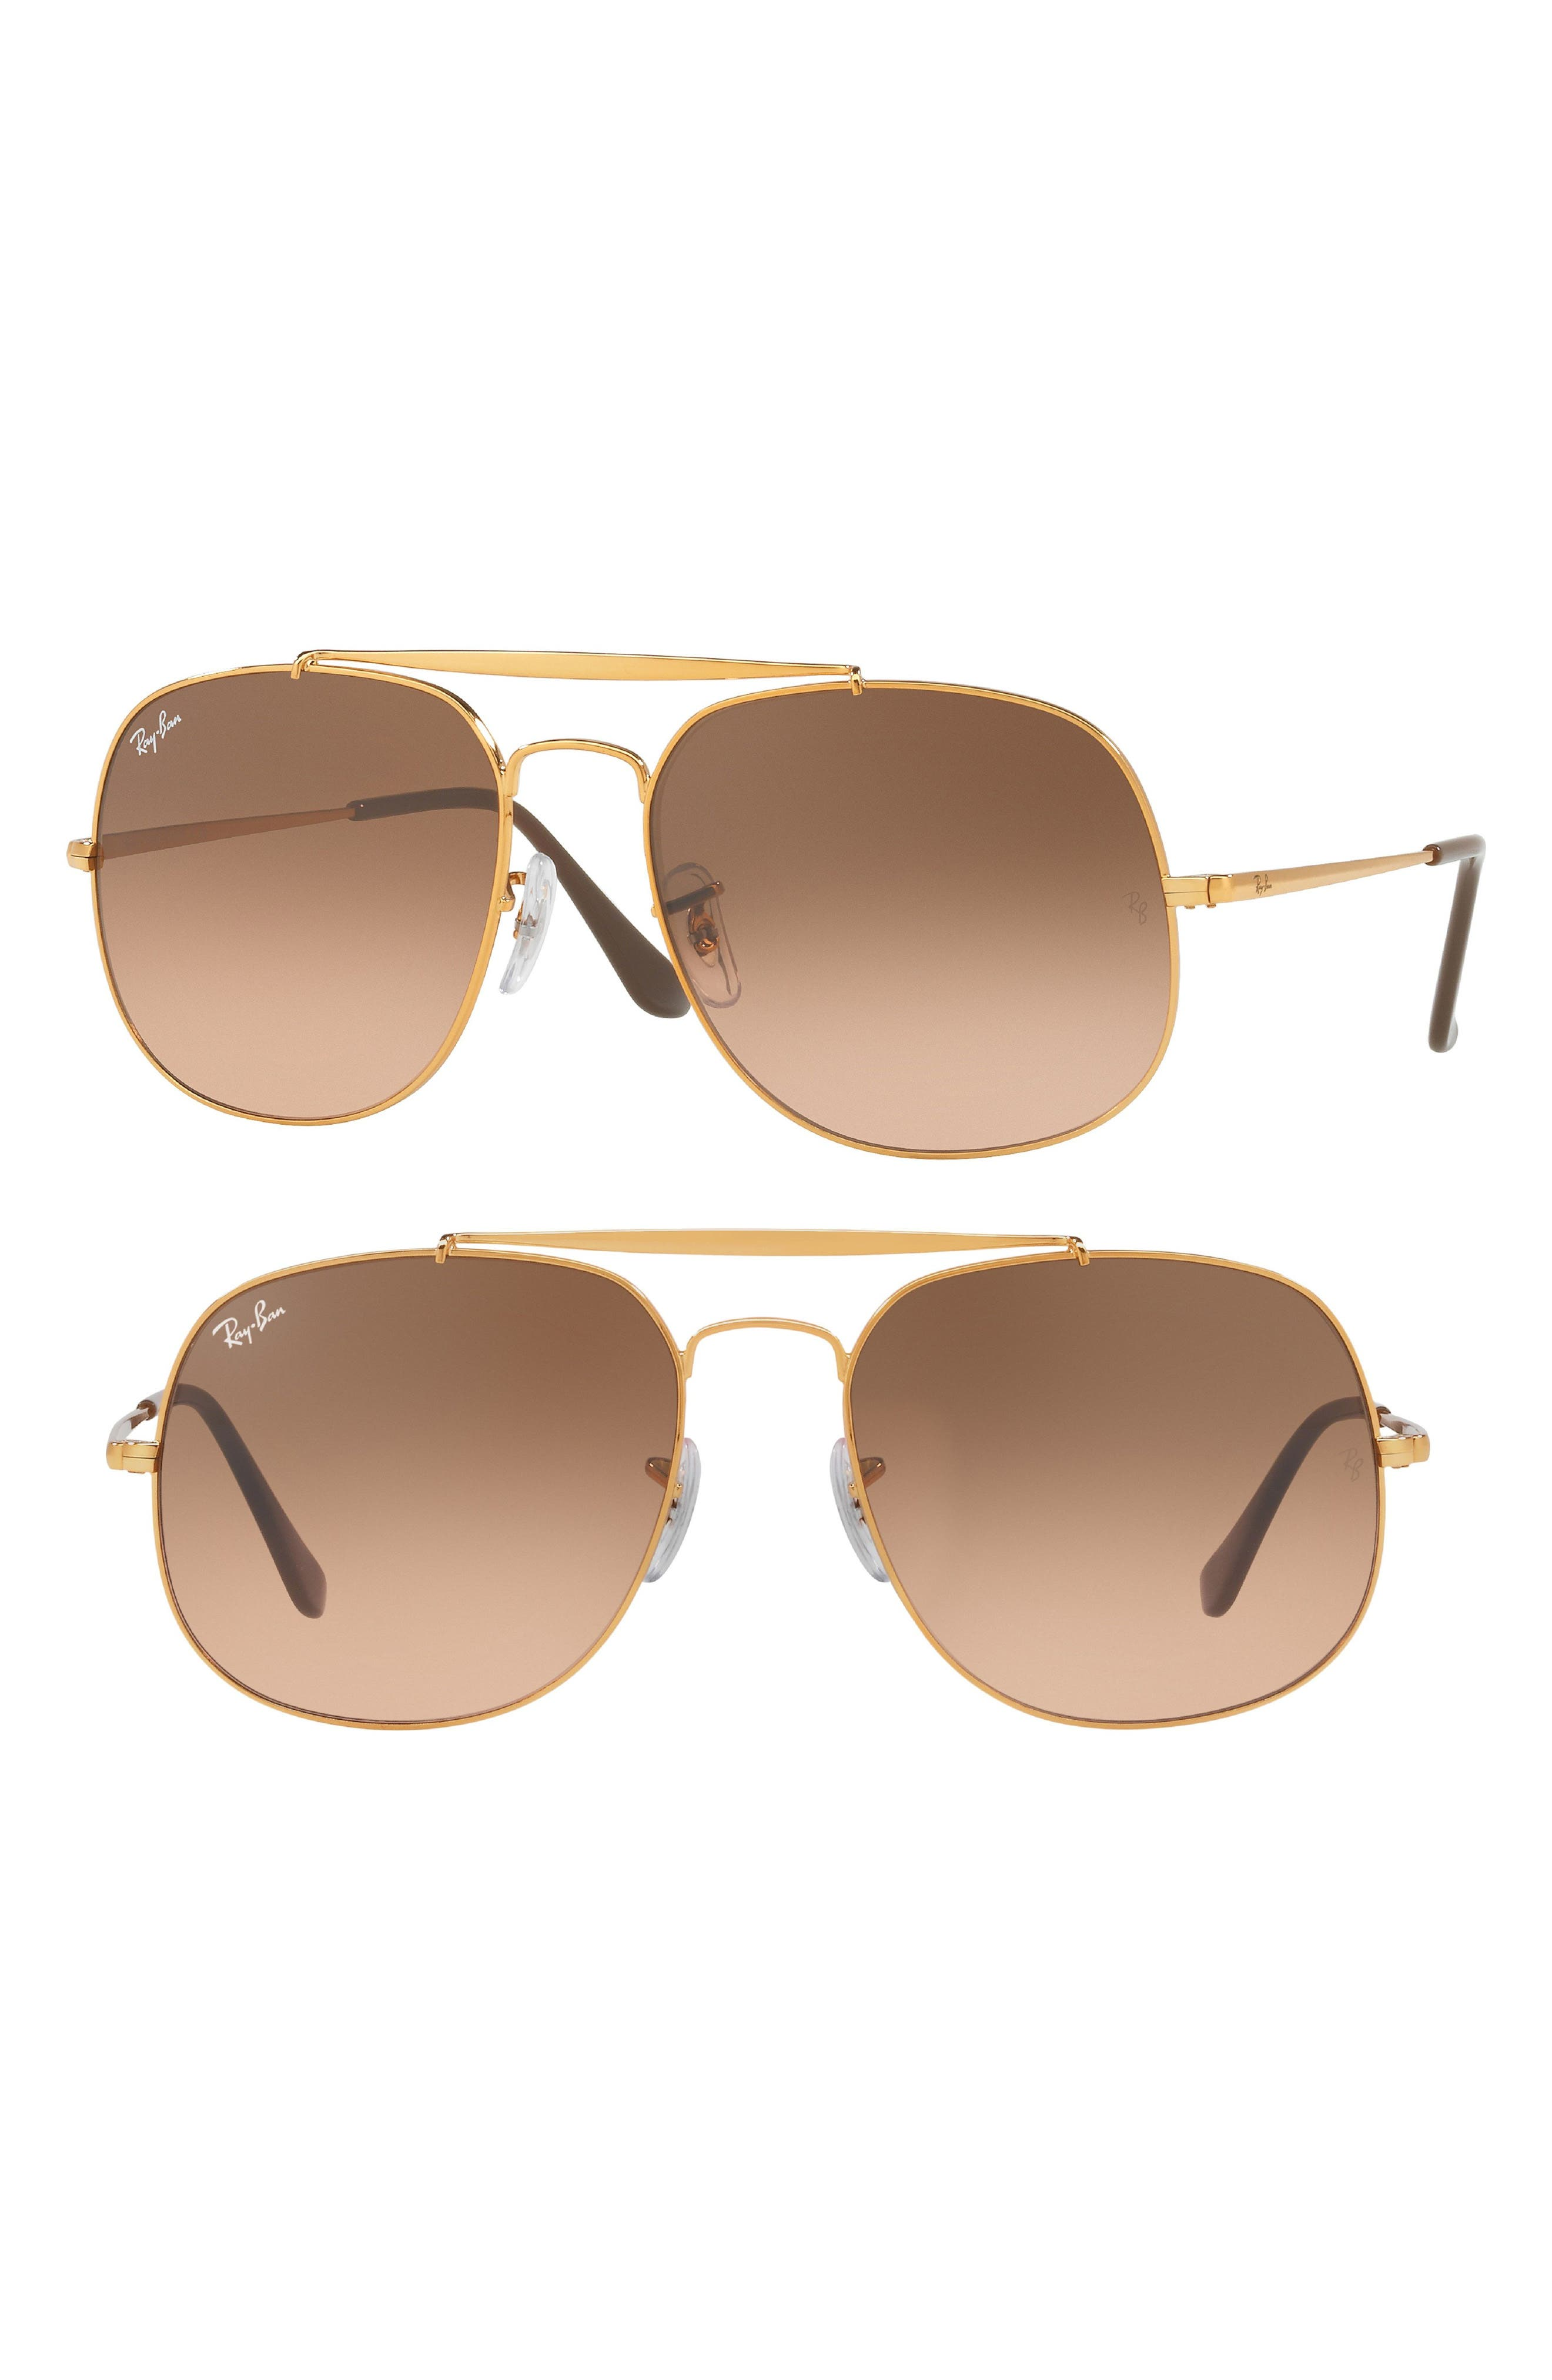 57mm Gradient Lens Square Aviator Sunglasses,                             Main thumbnail 1, color,